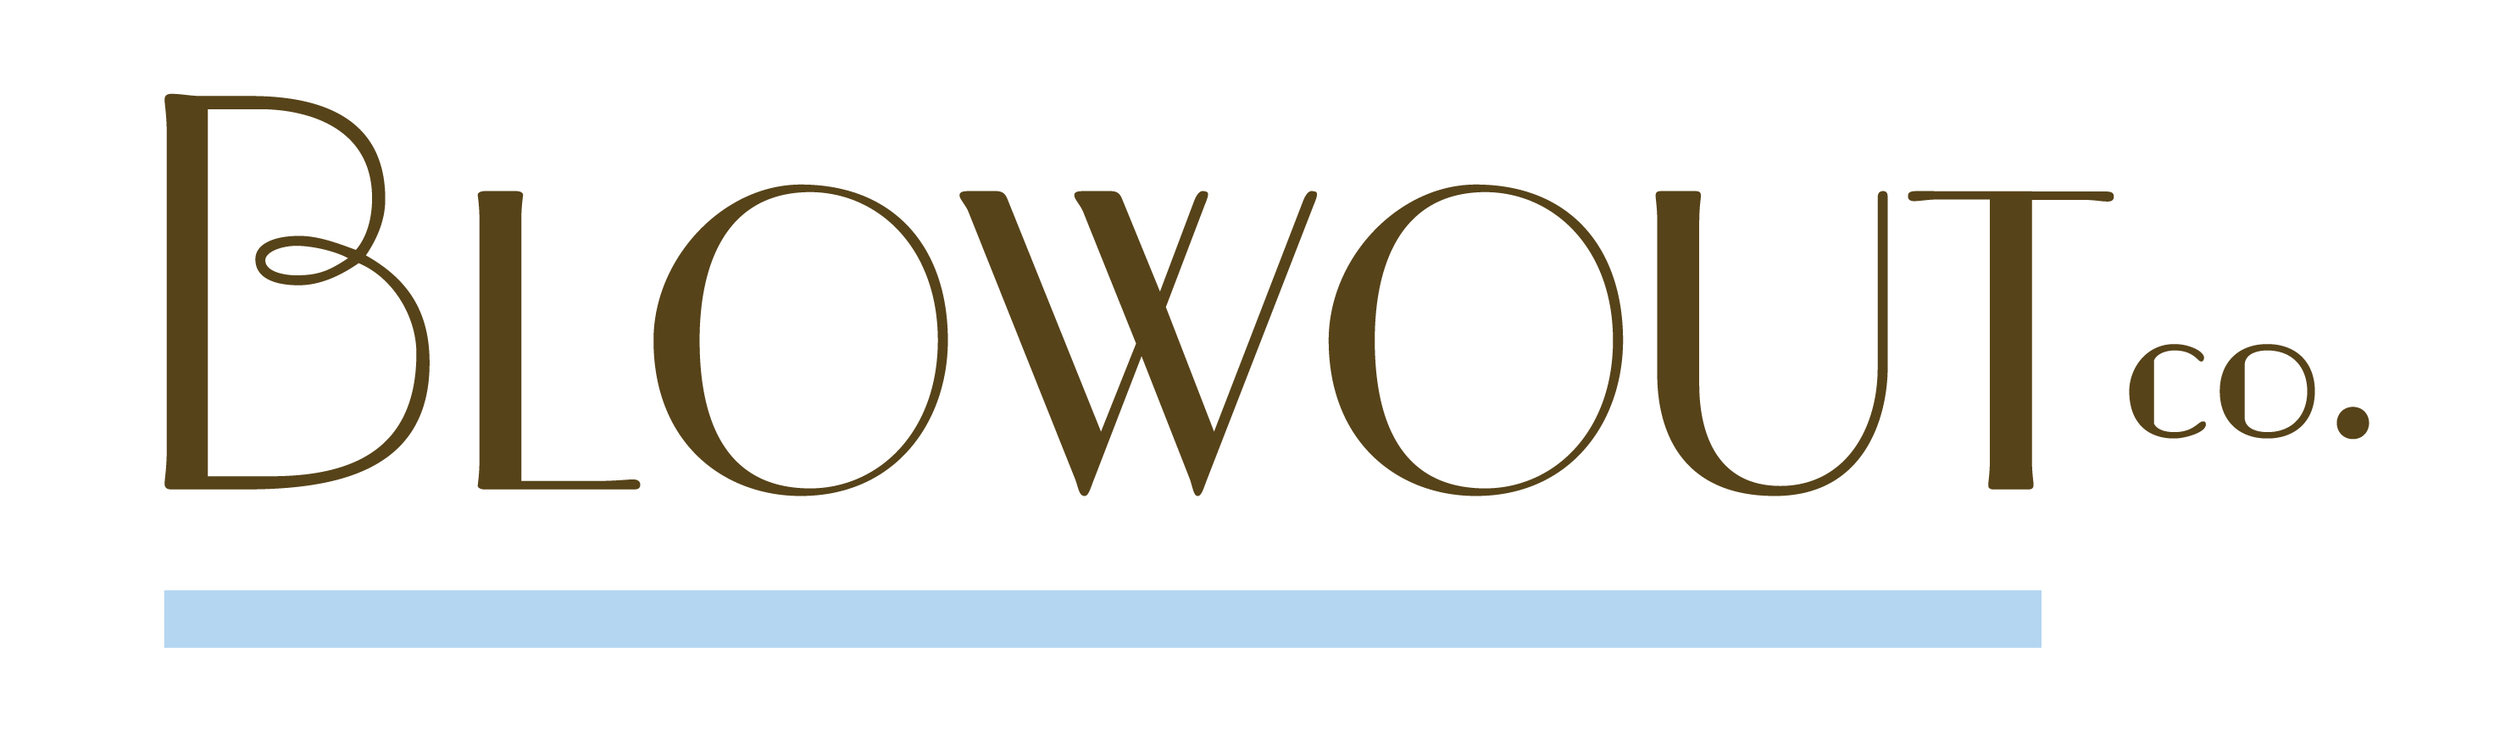 blowoutco logo .jpg